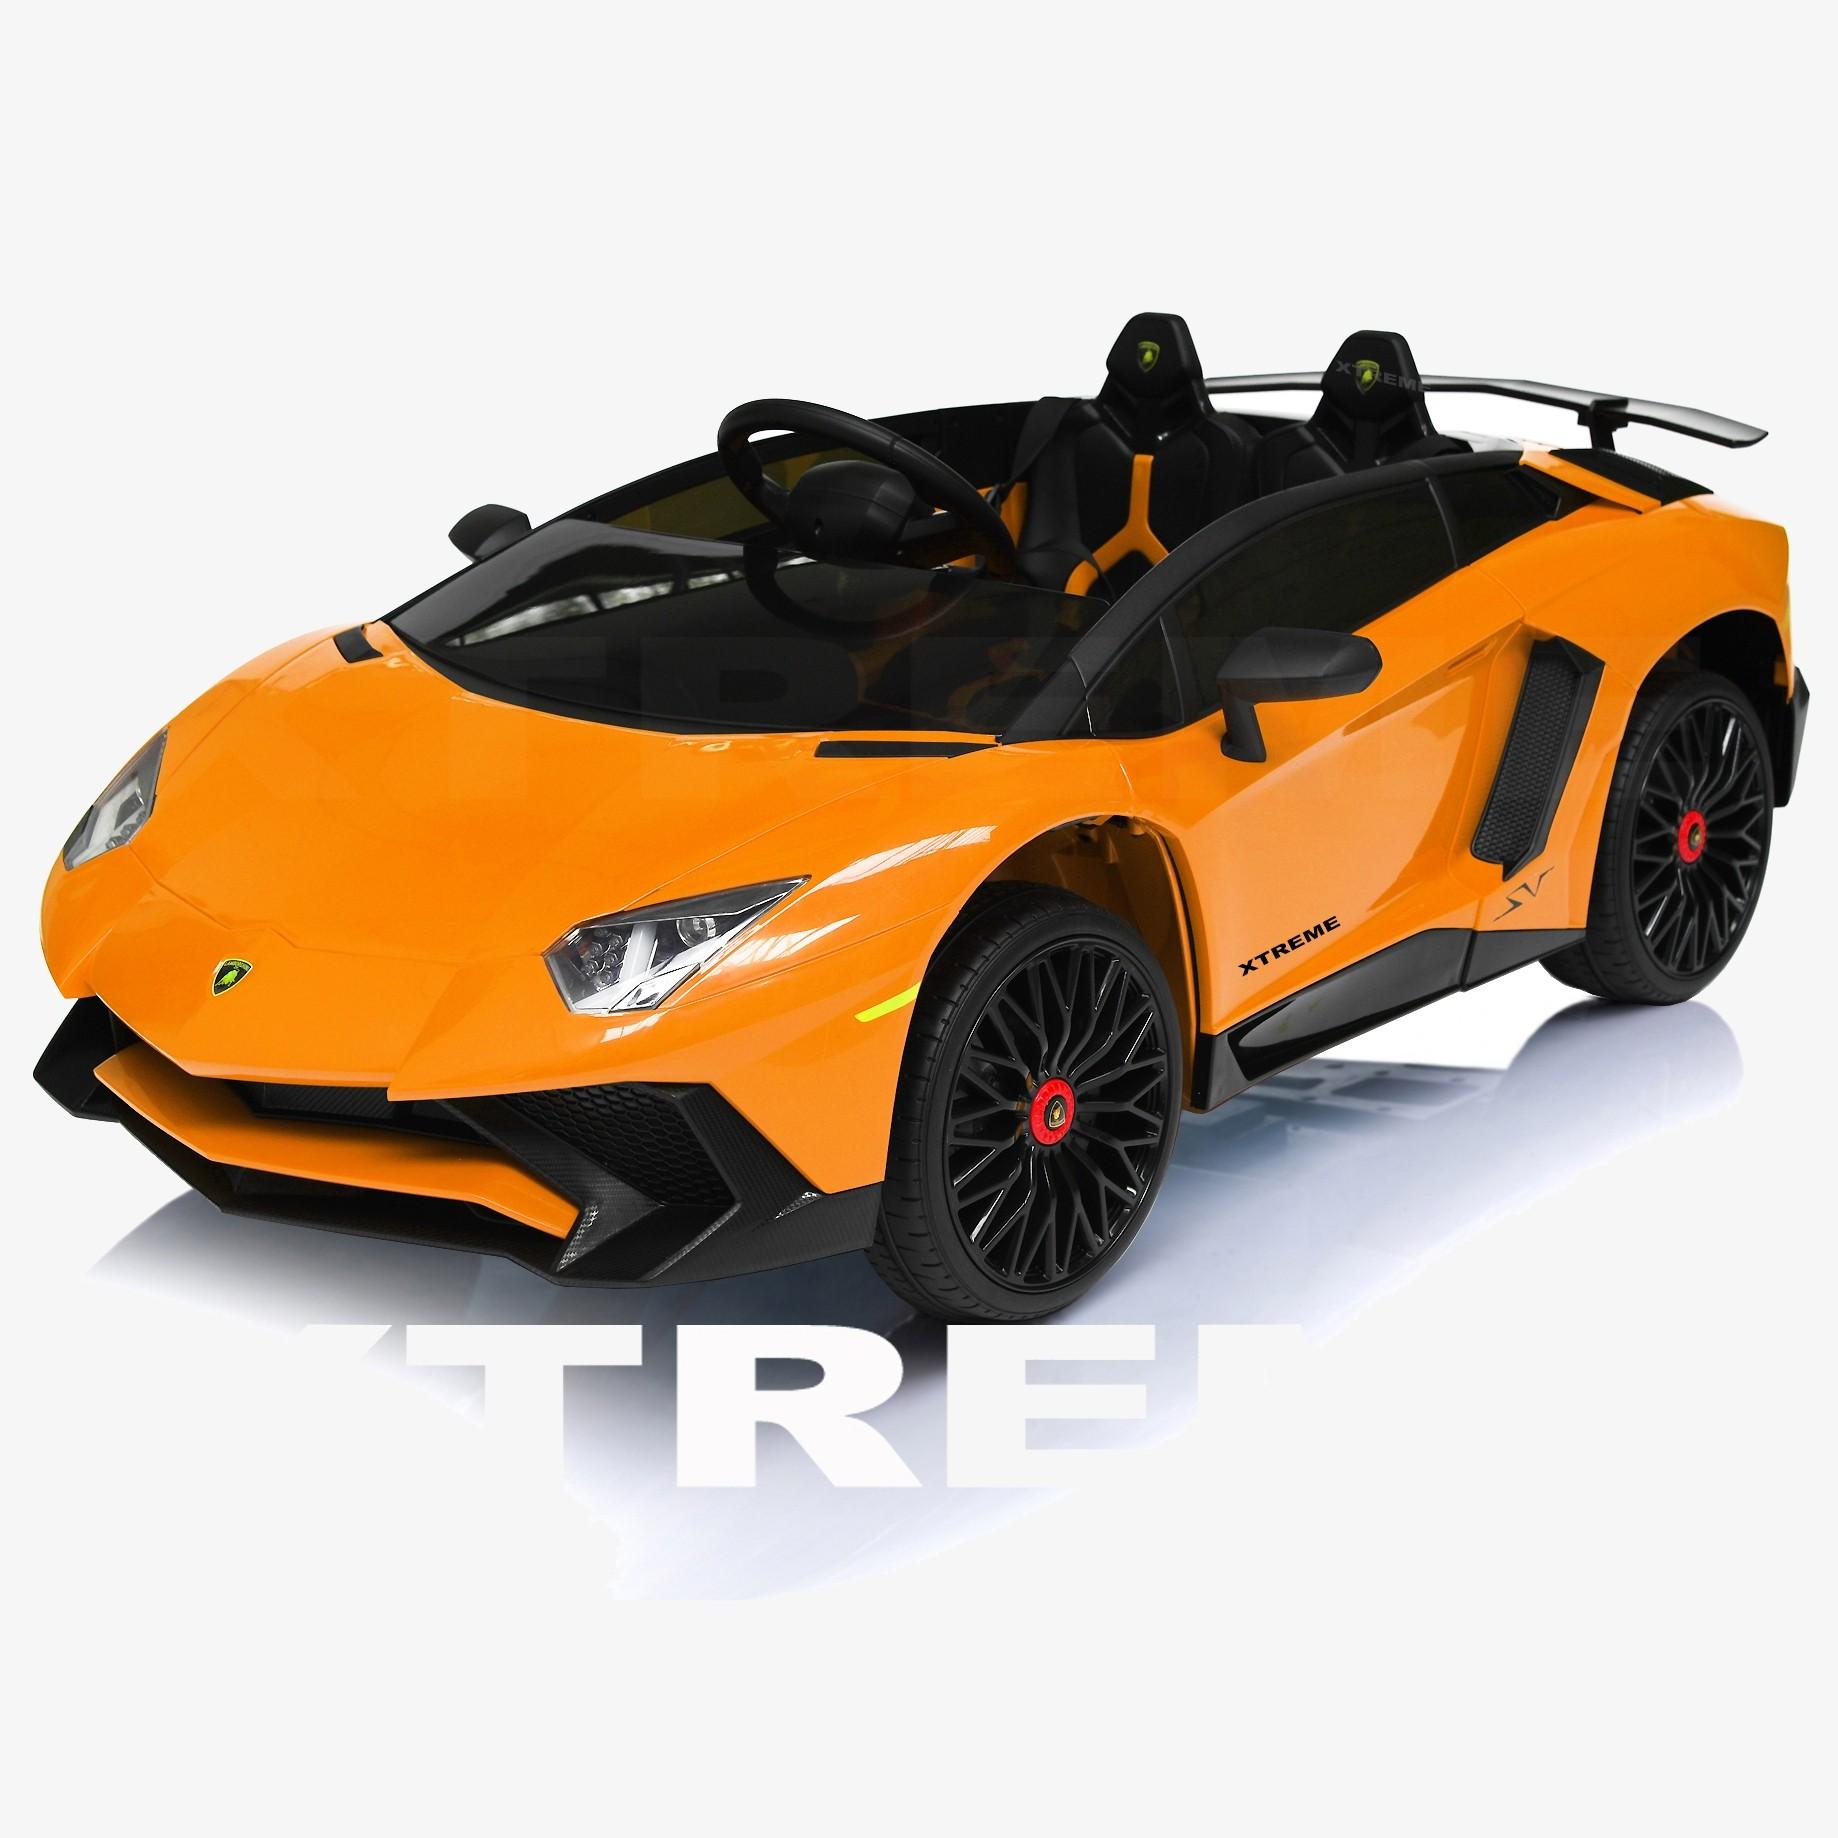 I Am A Rider Lamborghini Mp3 Download: Xtreme Toys